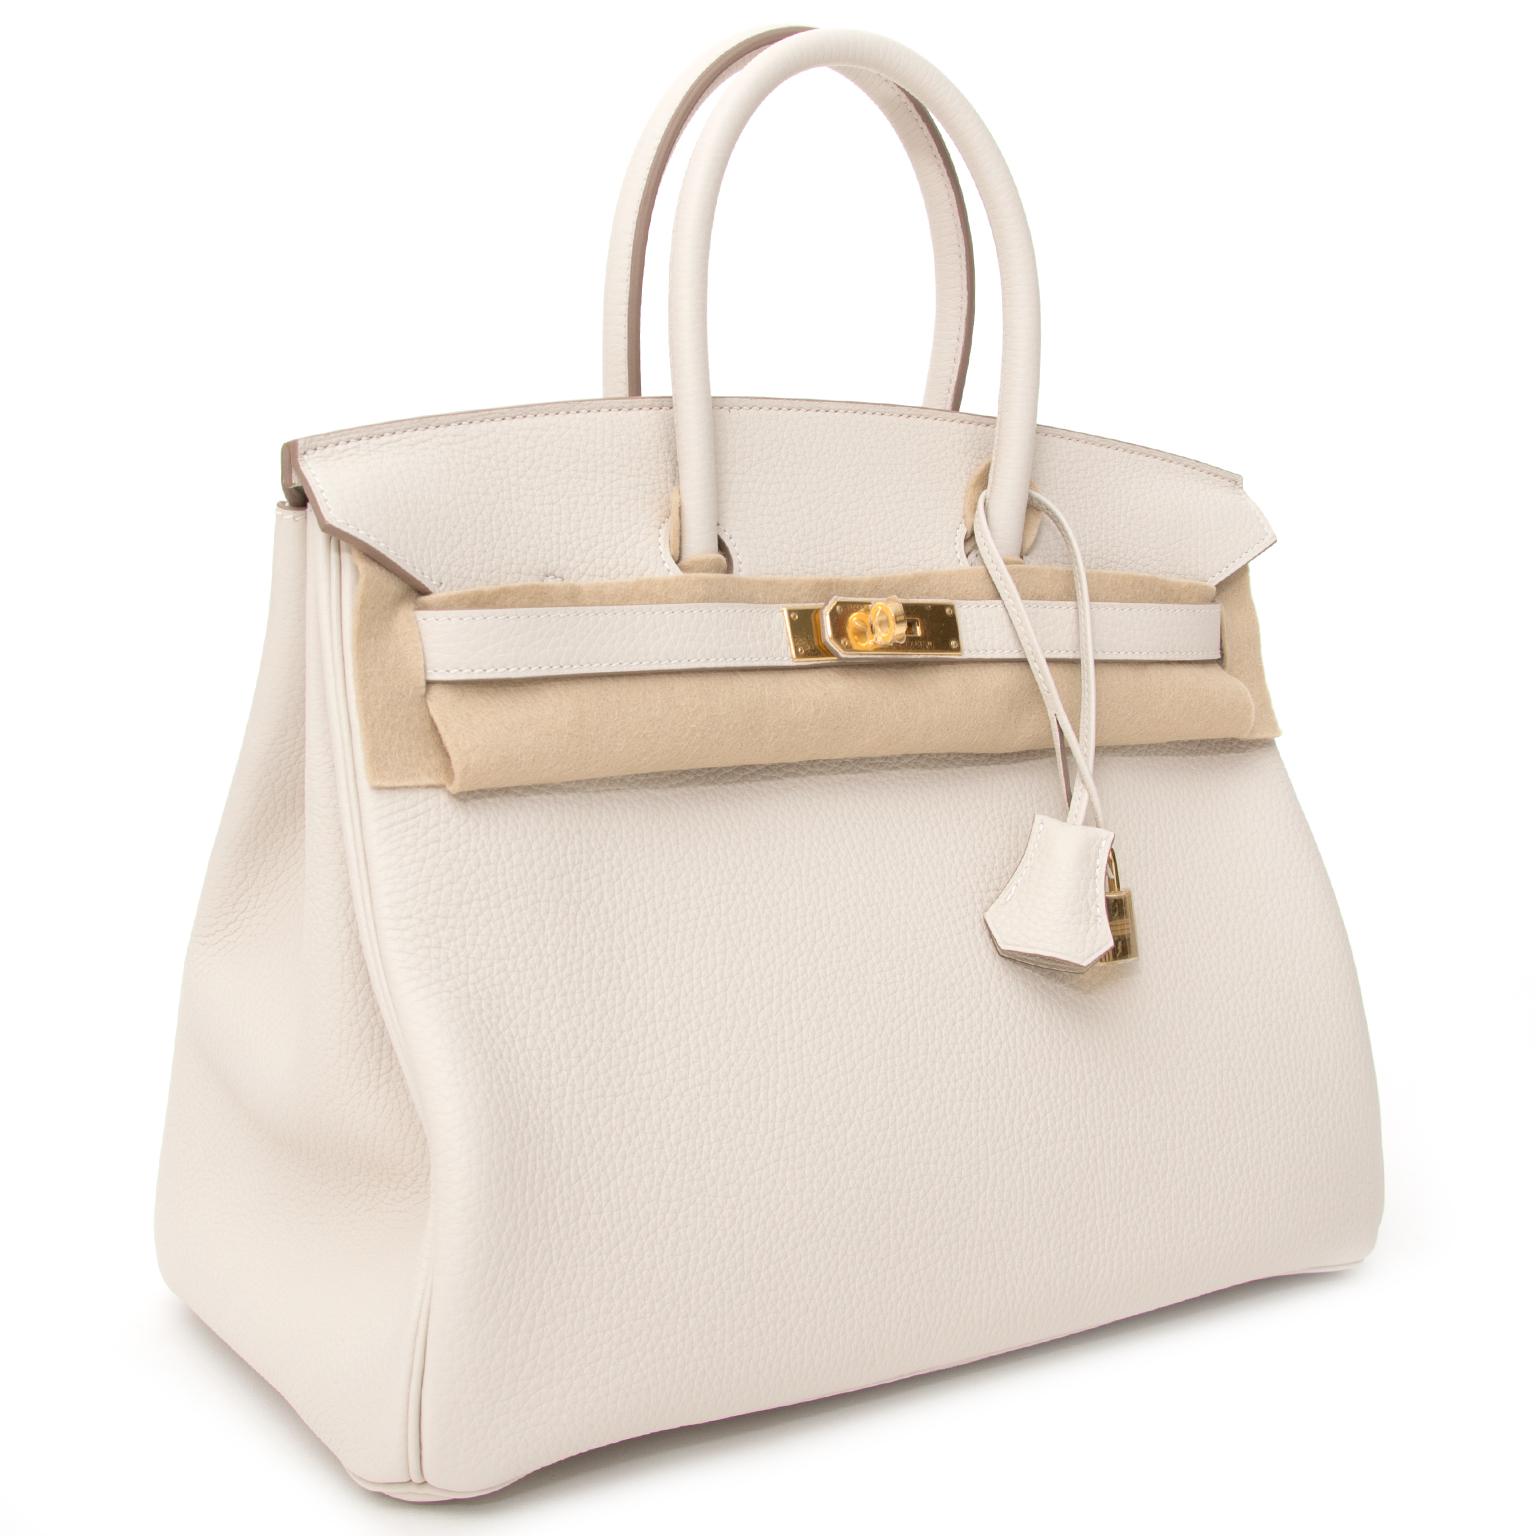 4560f59ddfd ... shop brand new 100% authentic Hermes Birkin 35 Craie White Clemence  Taurillon GHW worldwide